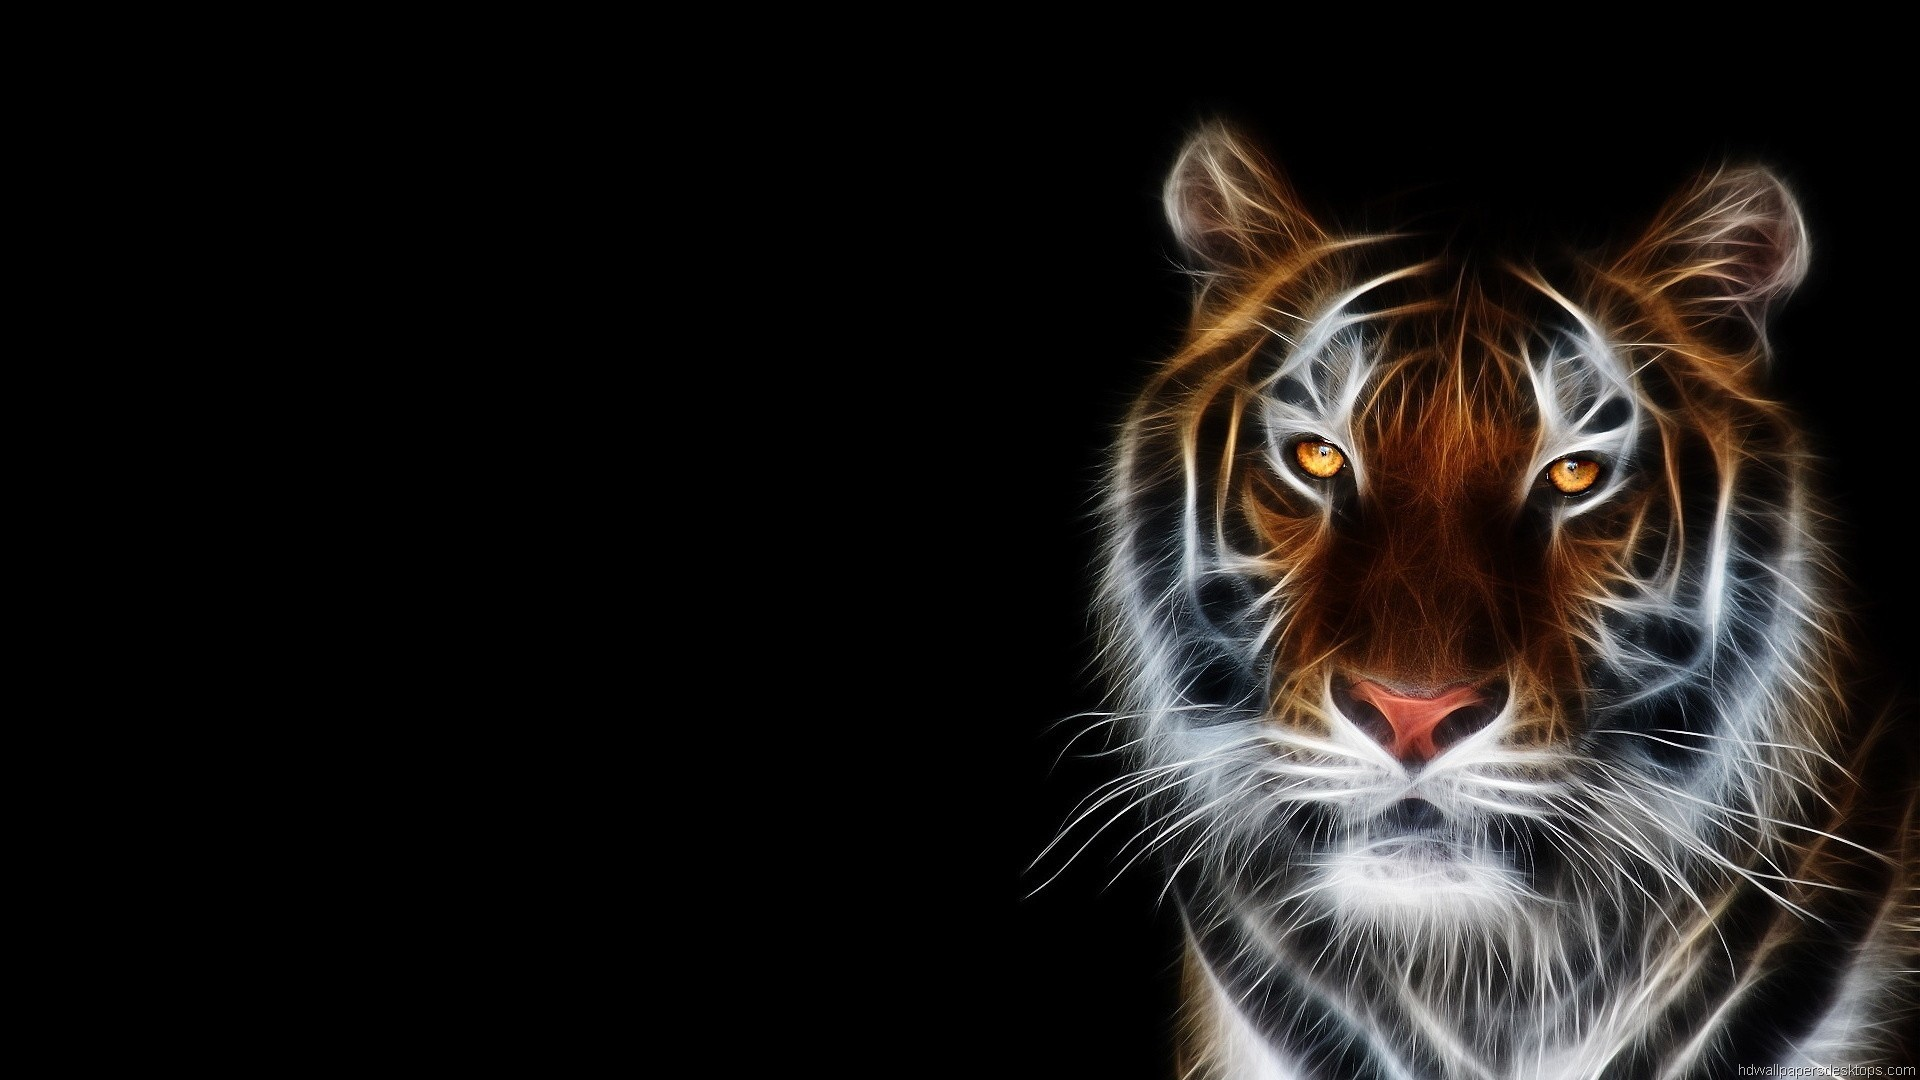 75 Animals Desktop Wallpapers on WallpaperPlay 1920x1080